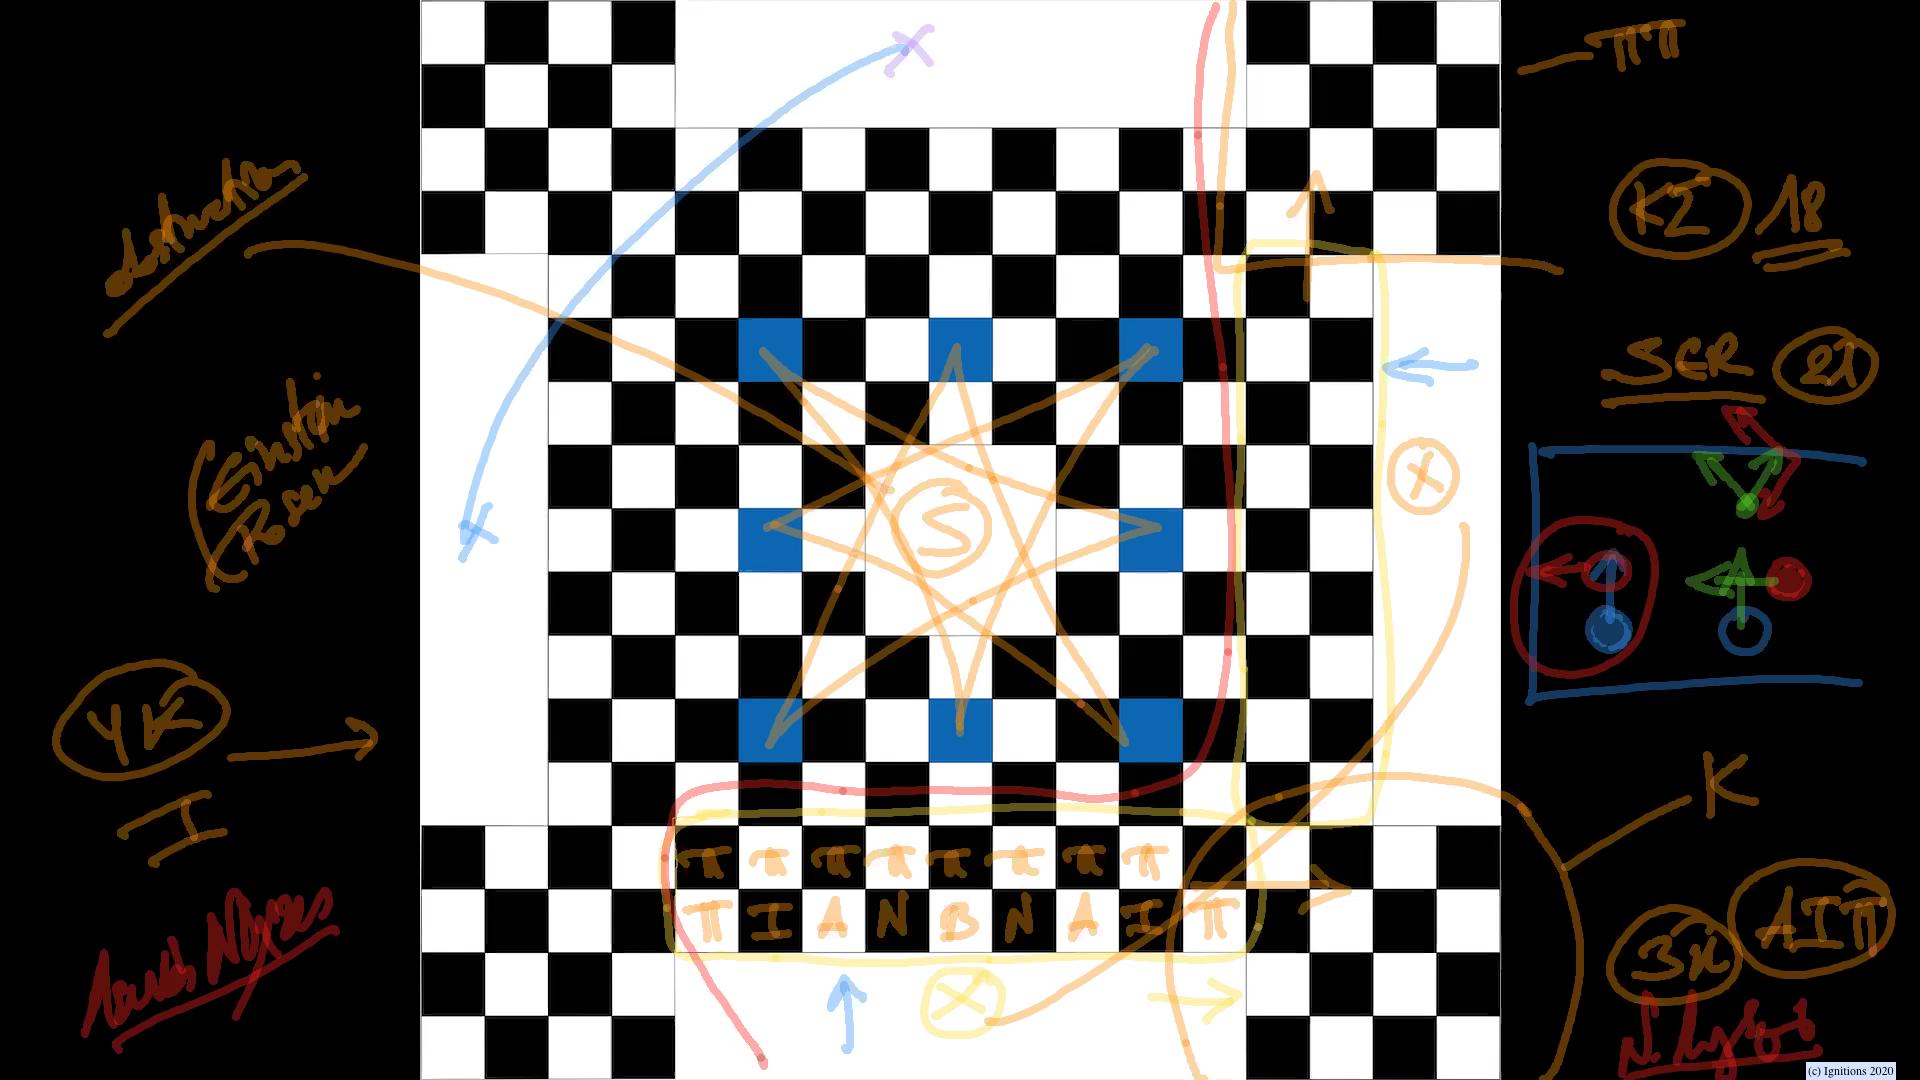 57204 - XII - Παιχνίδια Ανθρωπότητας. Έργο VIII. (Dessin)